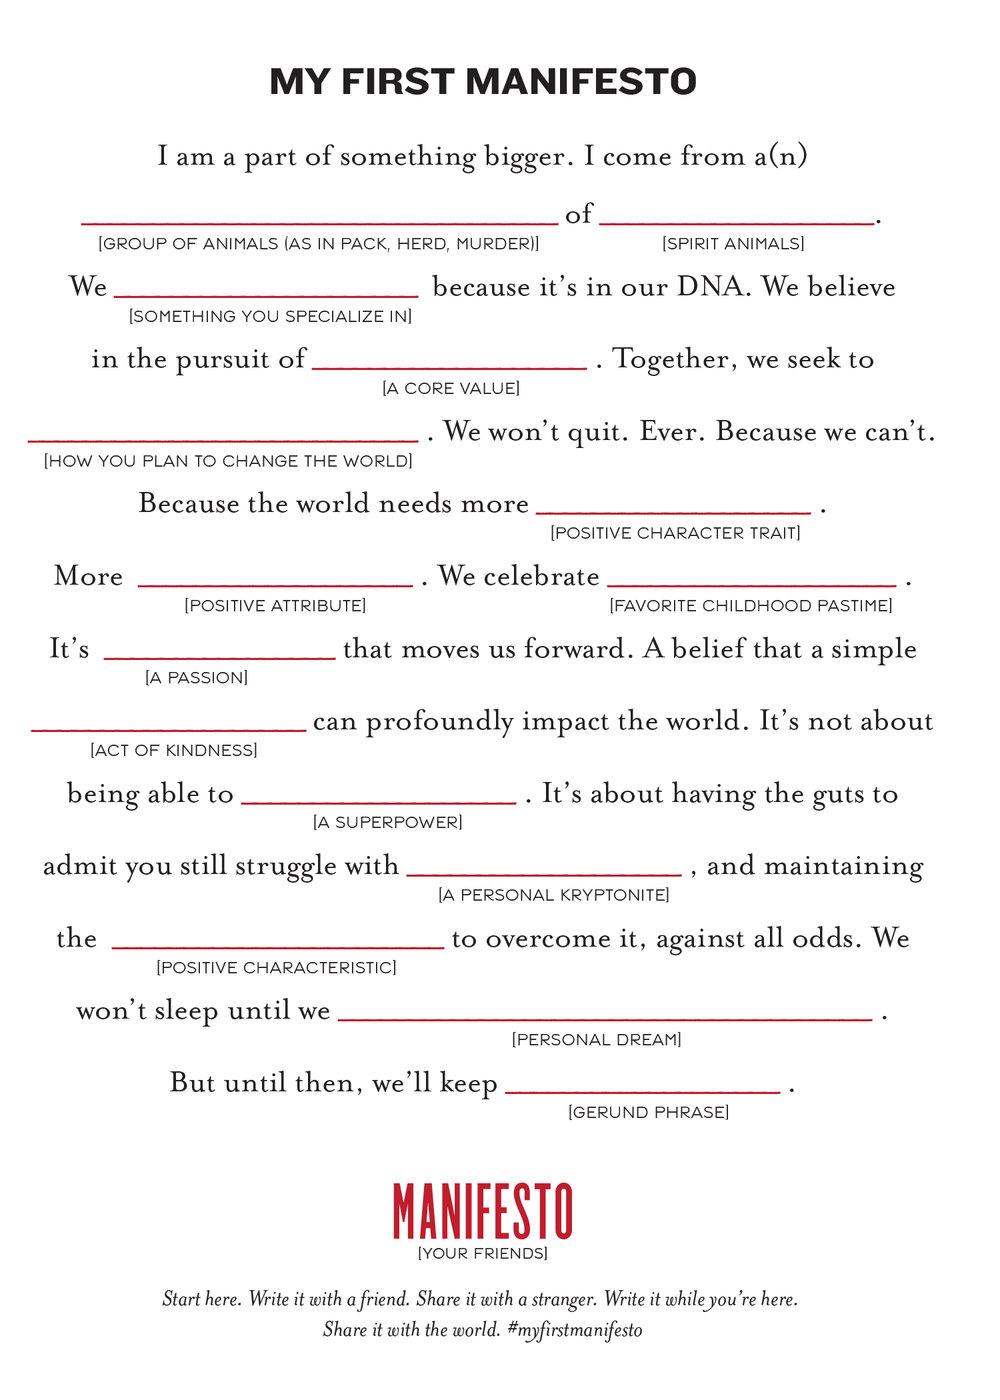 My-First-Manifesto